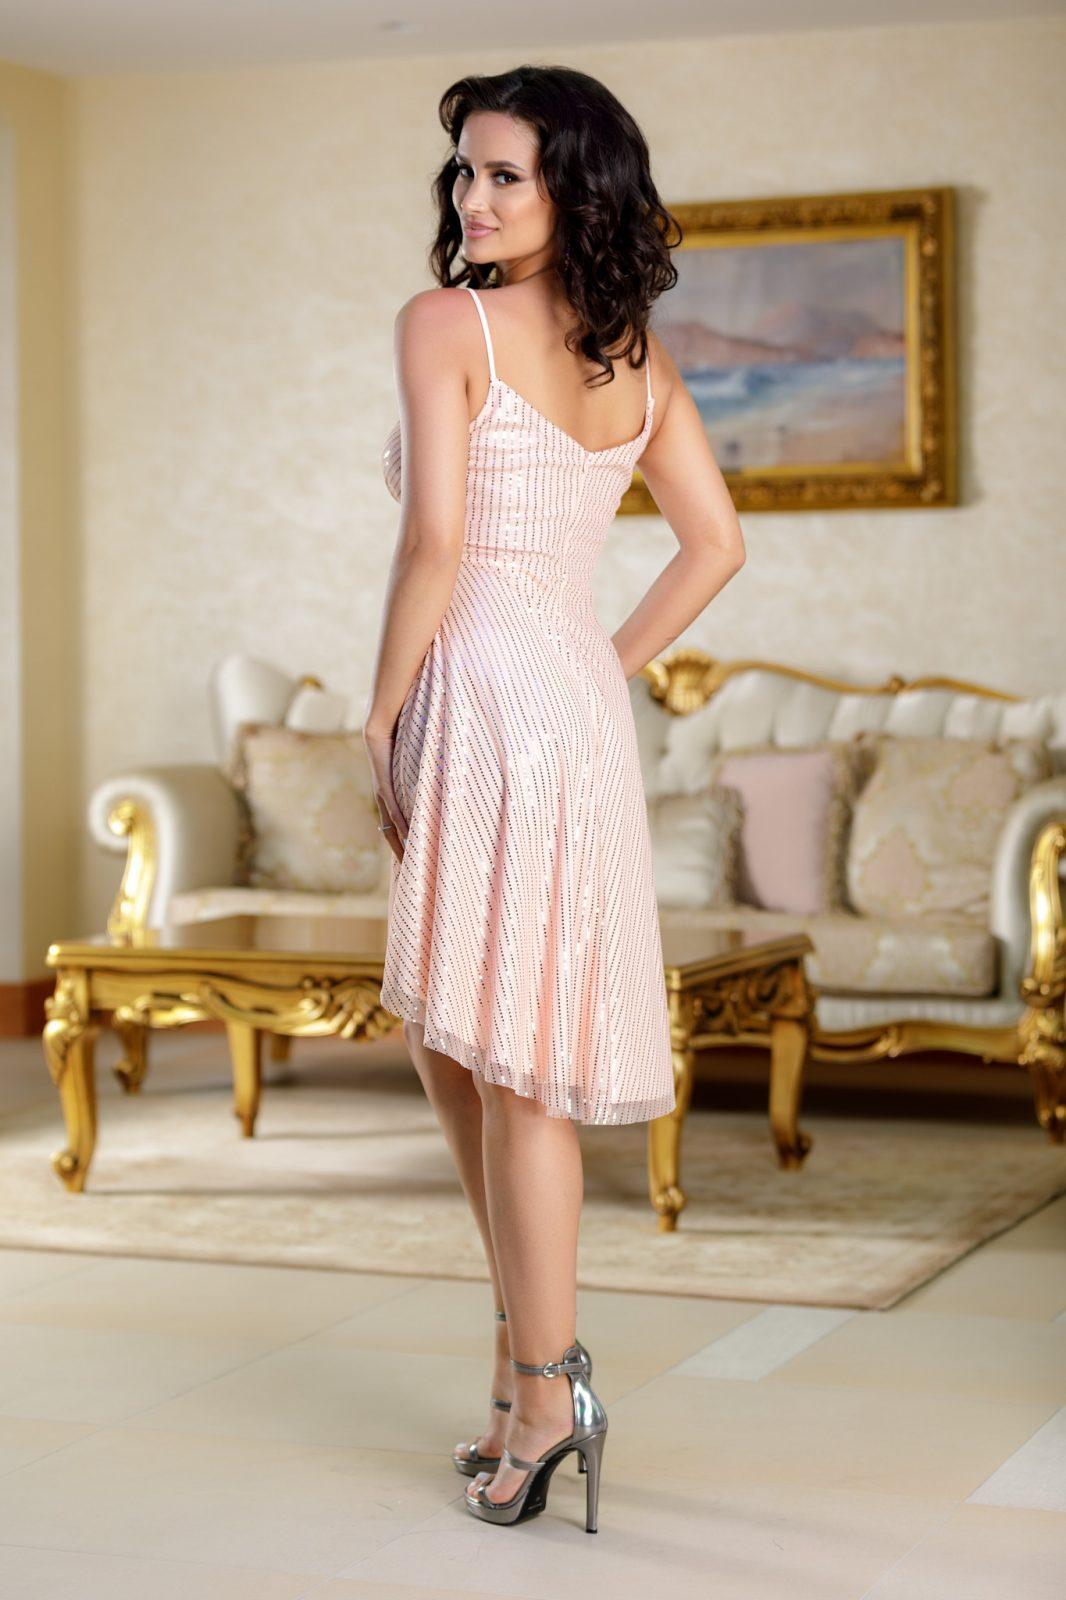 Meryem Ροζ Φόρεμα 4837